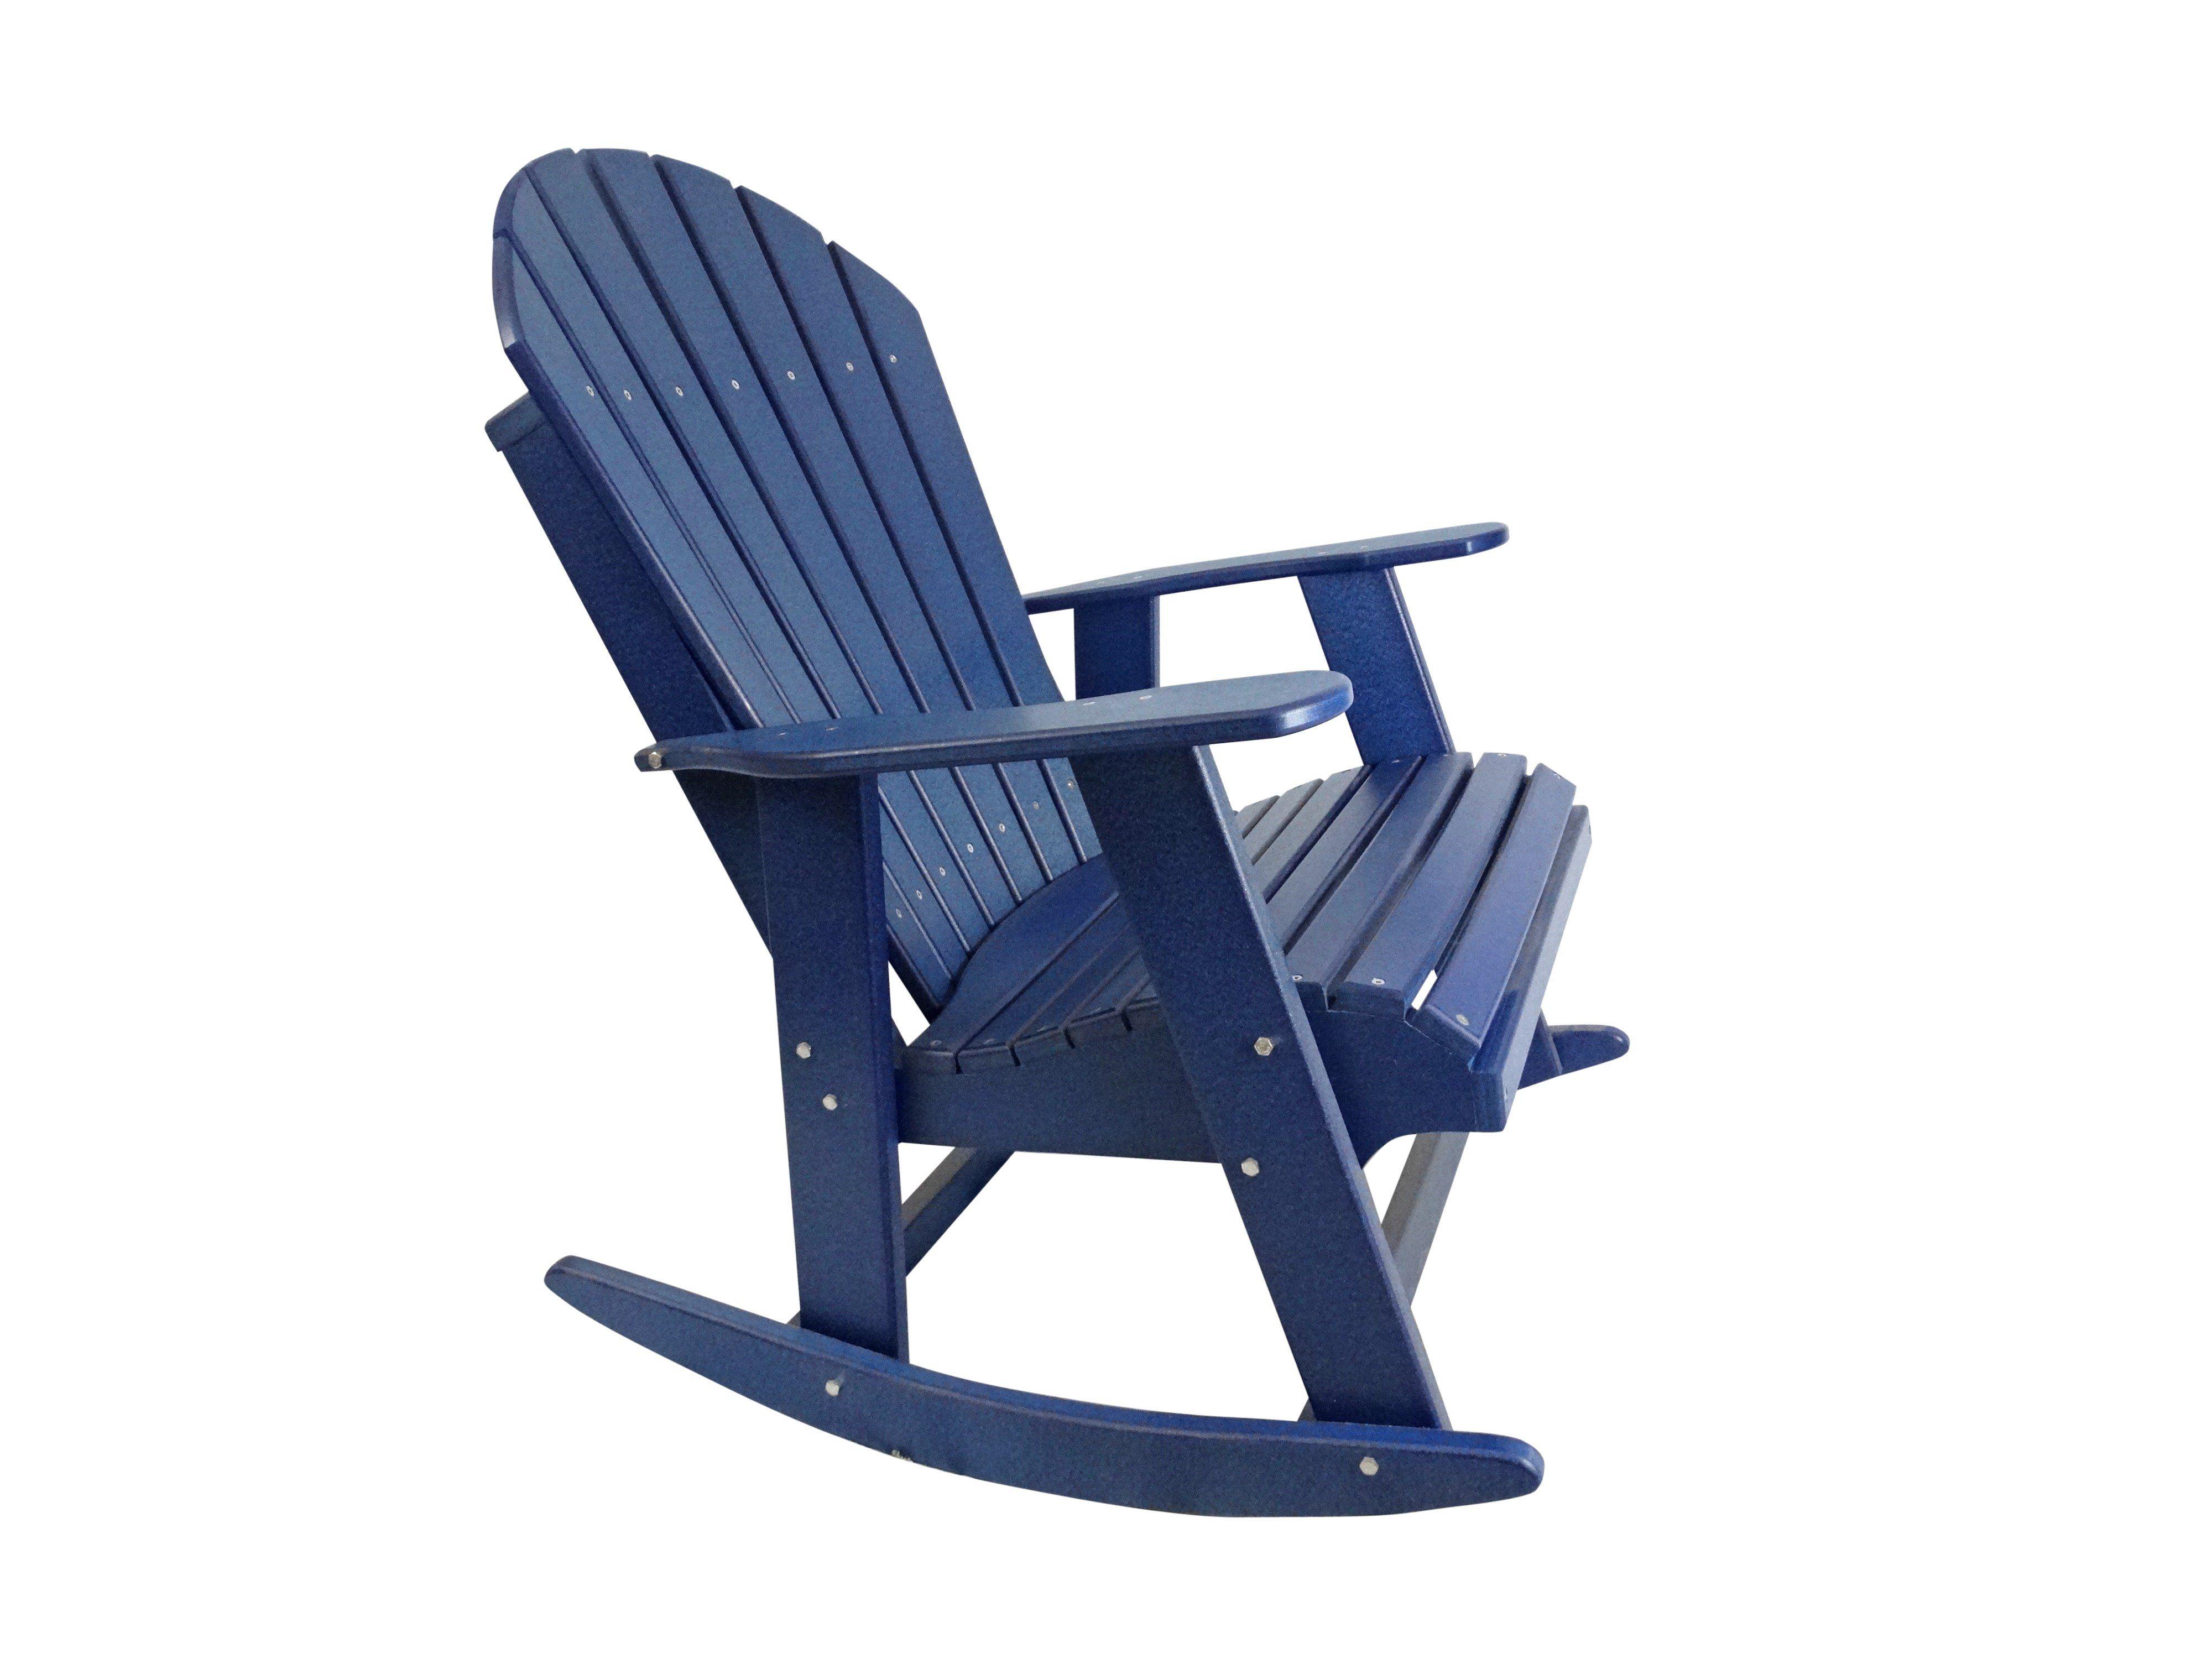 Poly Adirondack Rocking Chair Products Adirondack